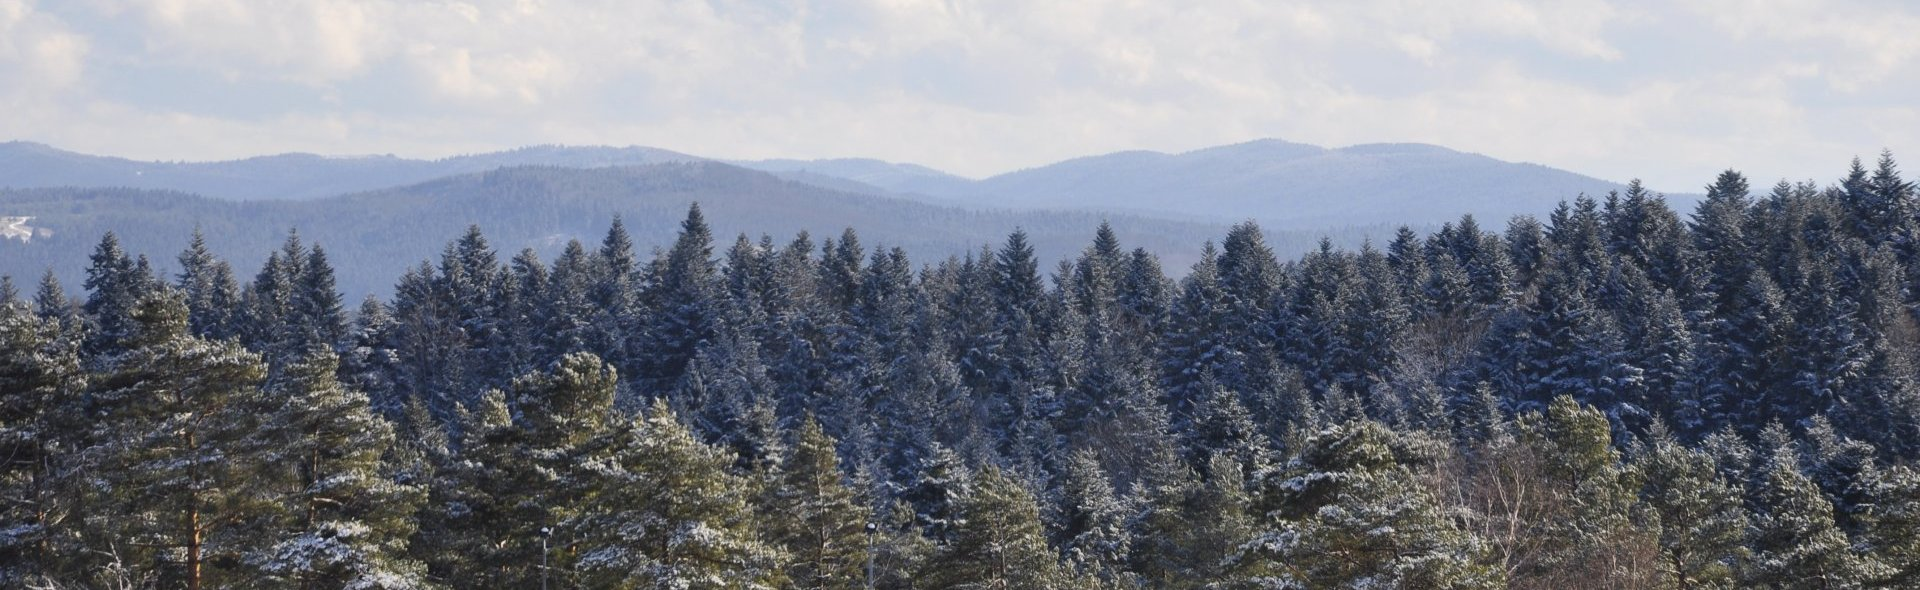 Зима наступила в Арламове!